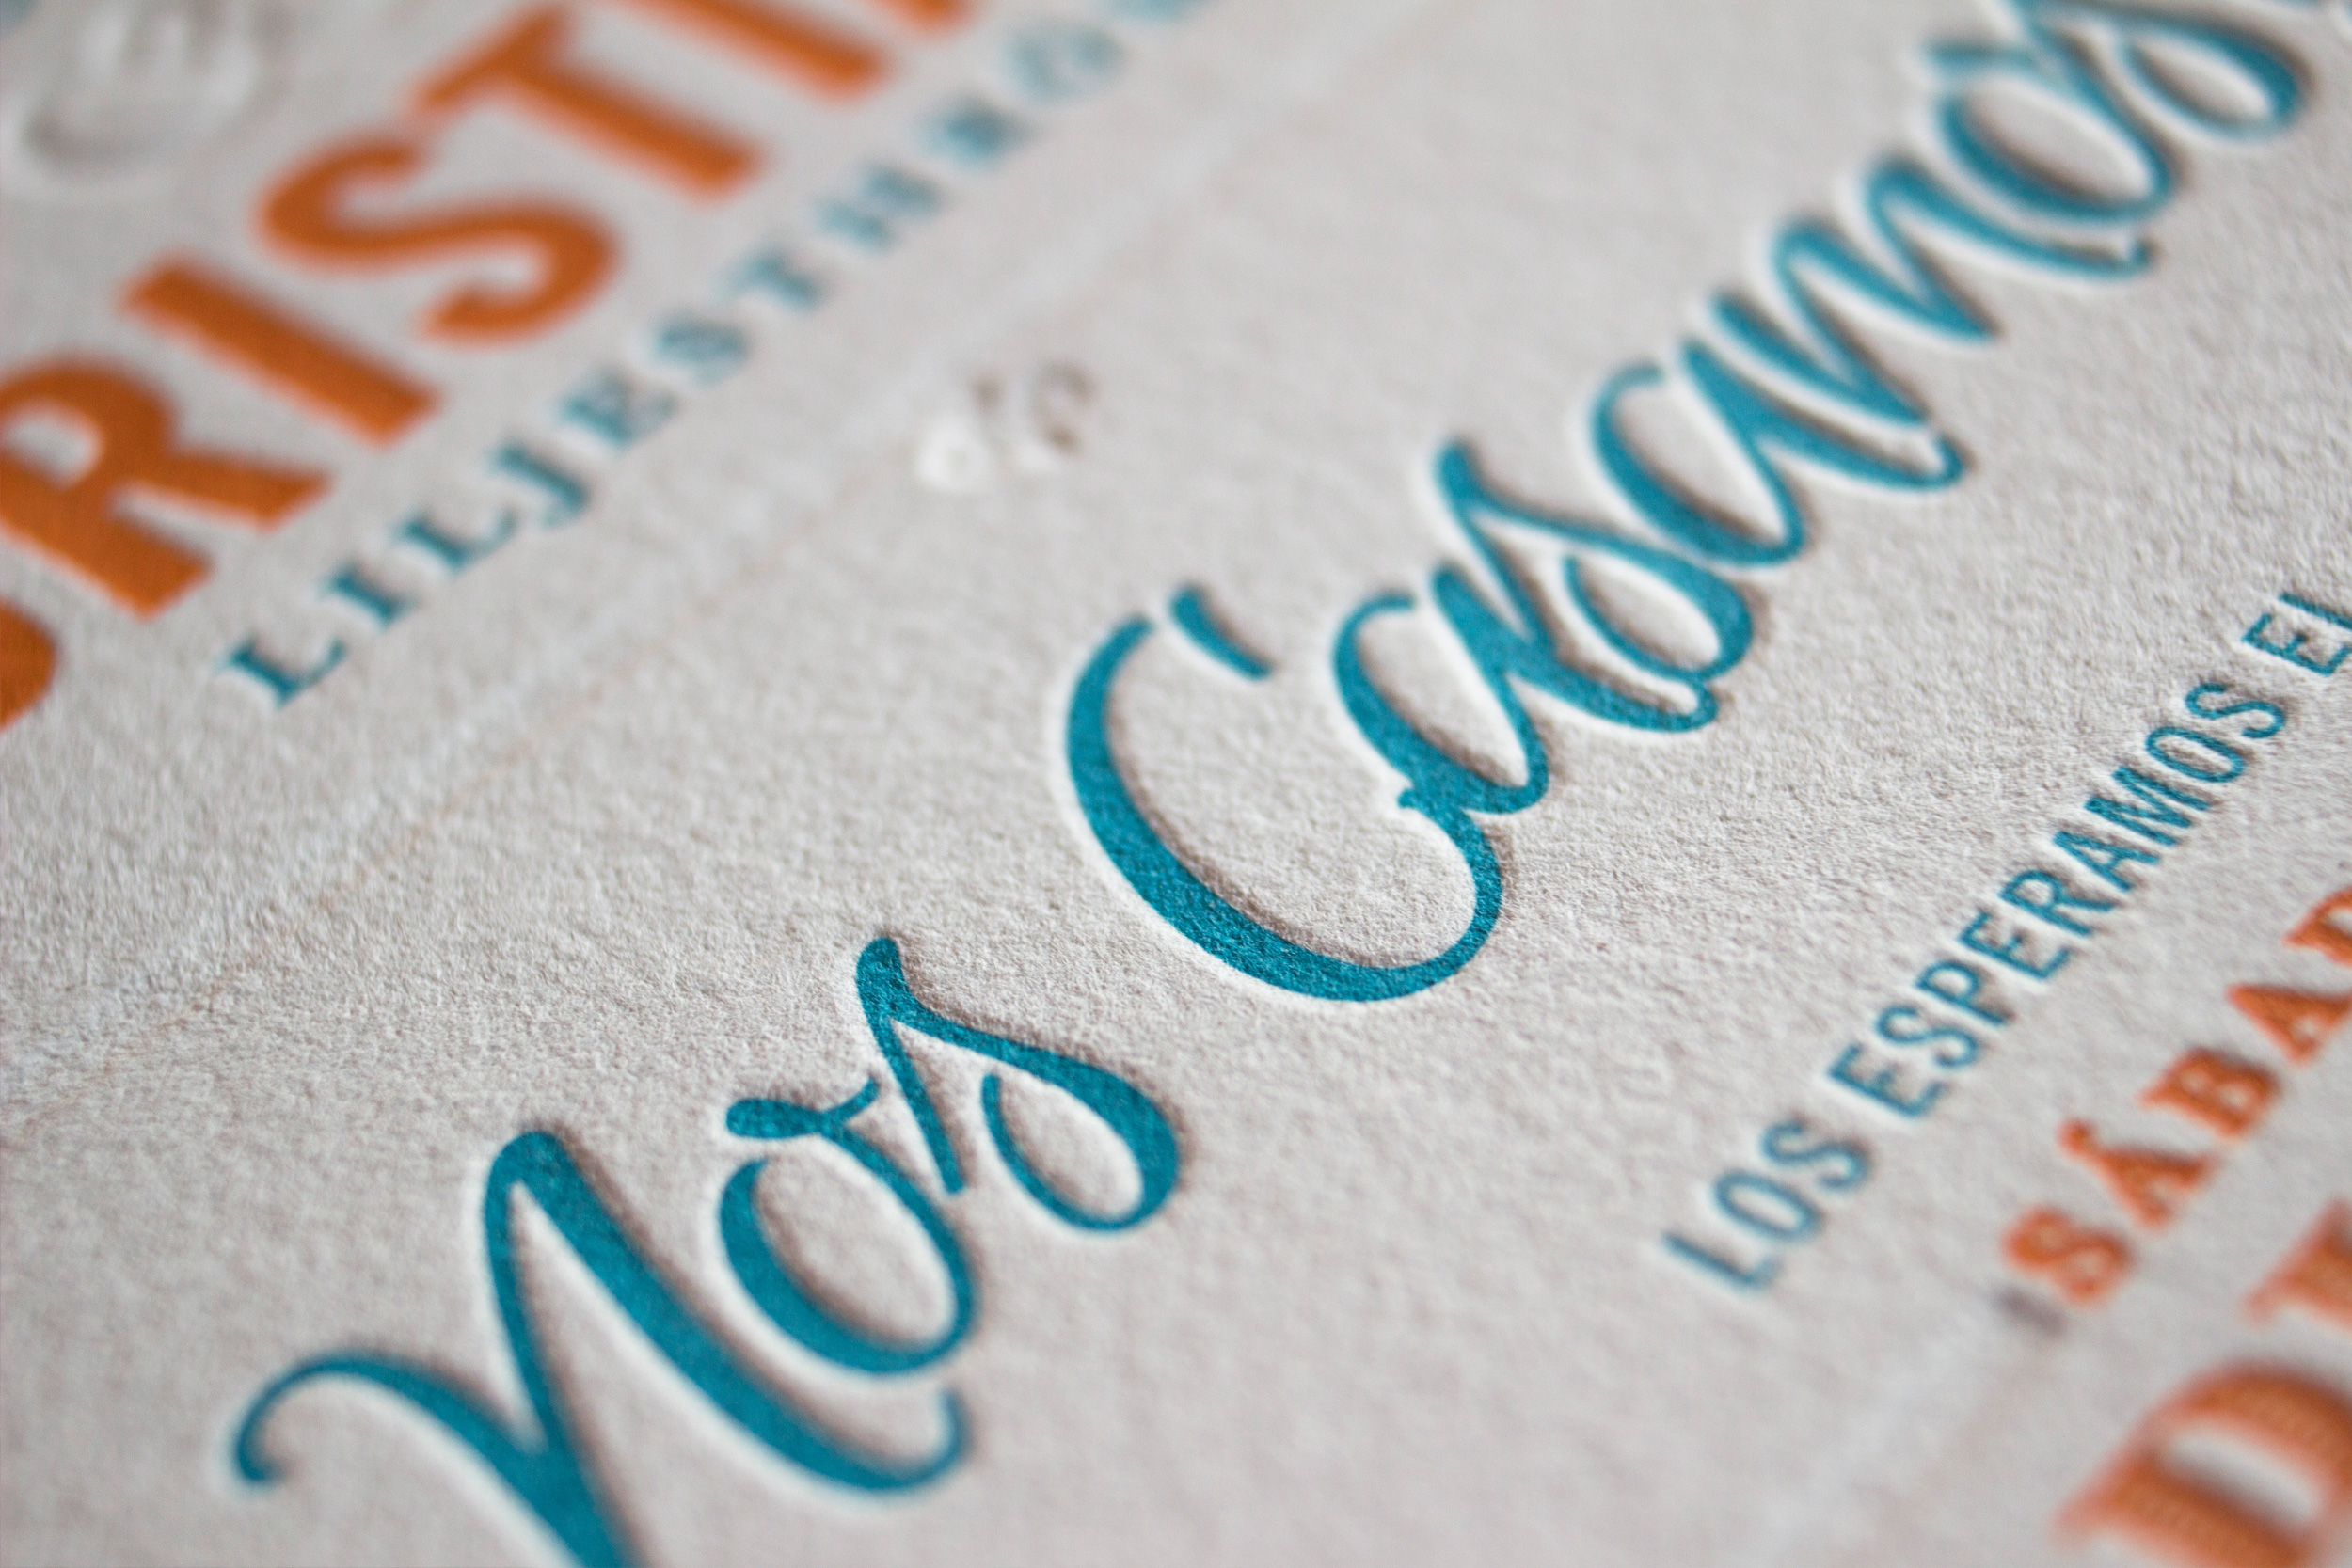 tarjetas-invitaciones-mariajulia&cristian2-papel-principal-letterpress-imprenta-tipografica-1.jpg